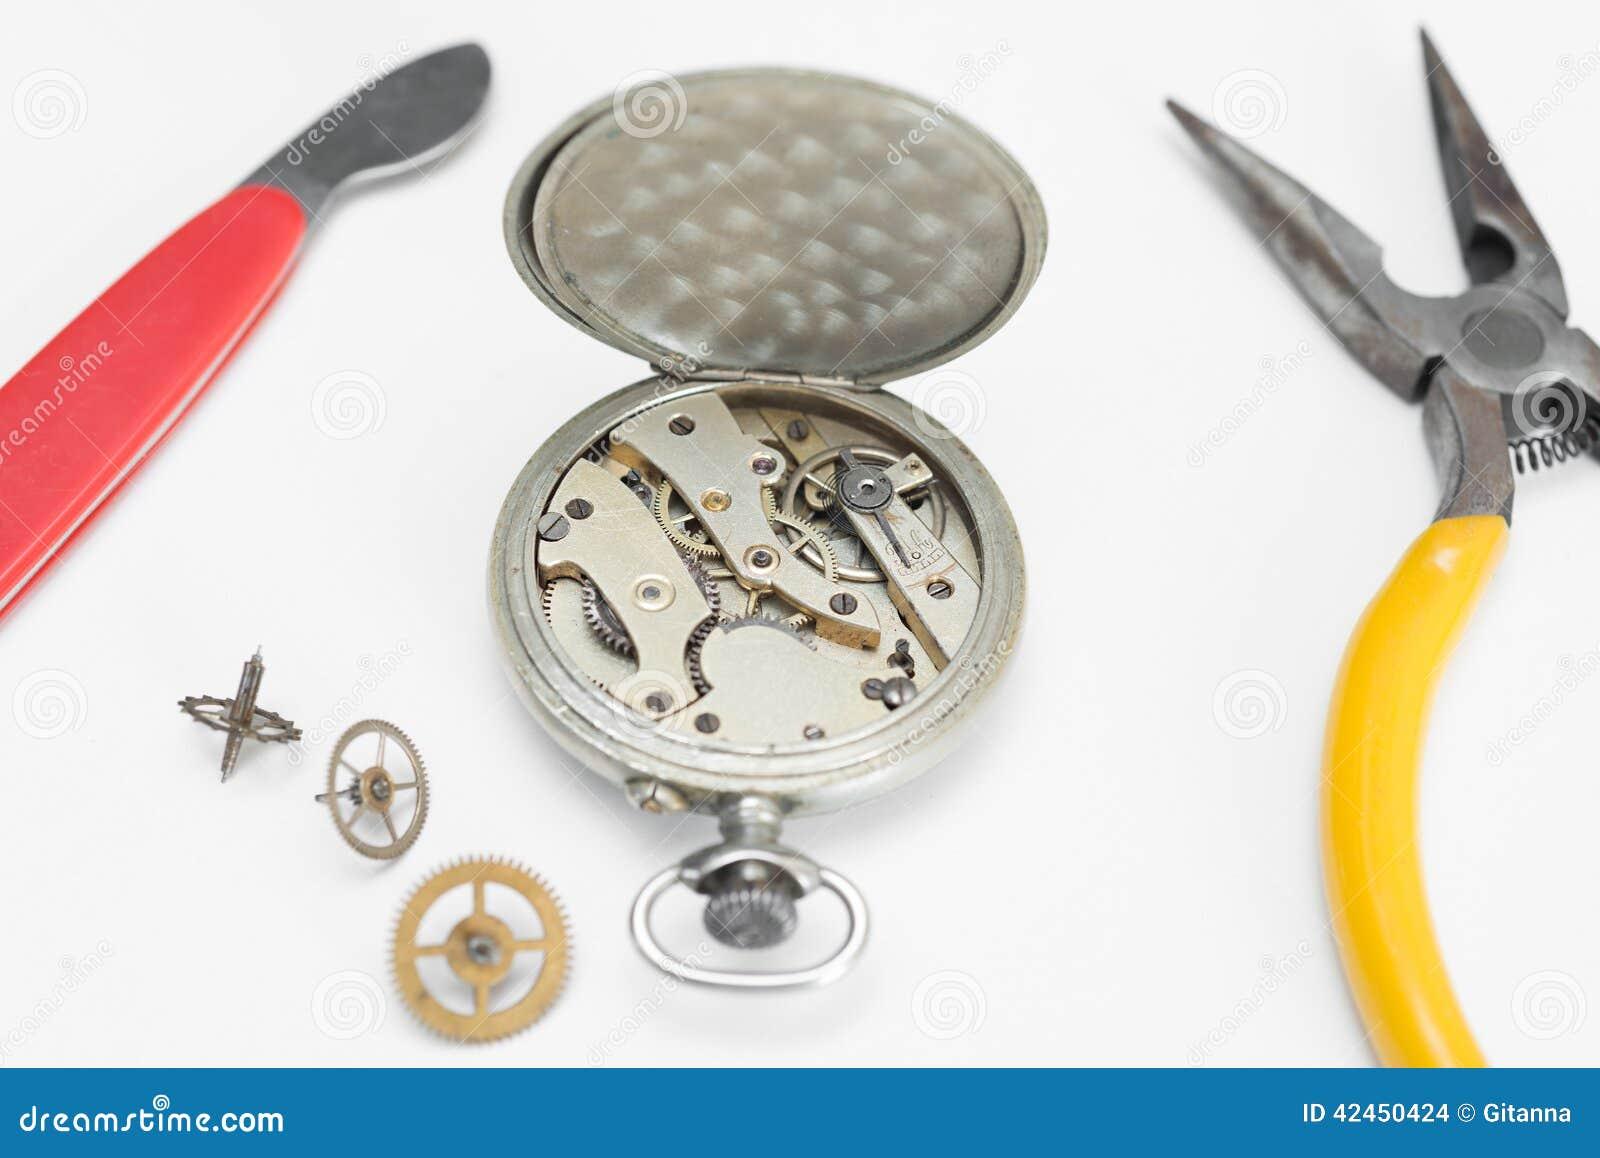 Reparatur von Uhren